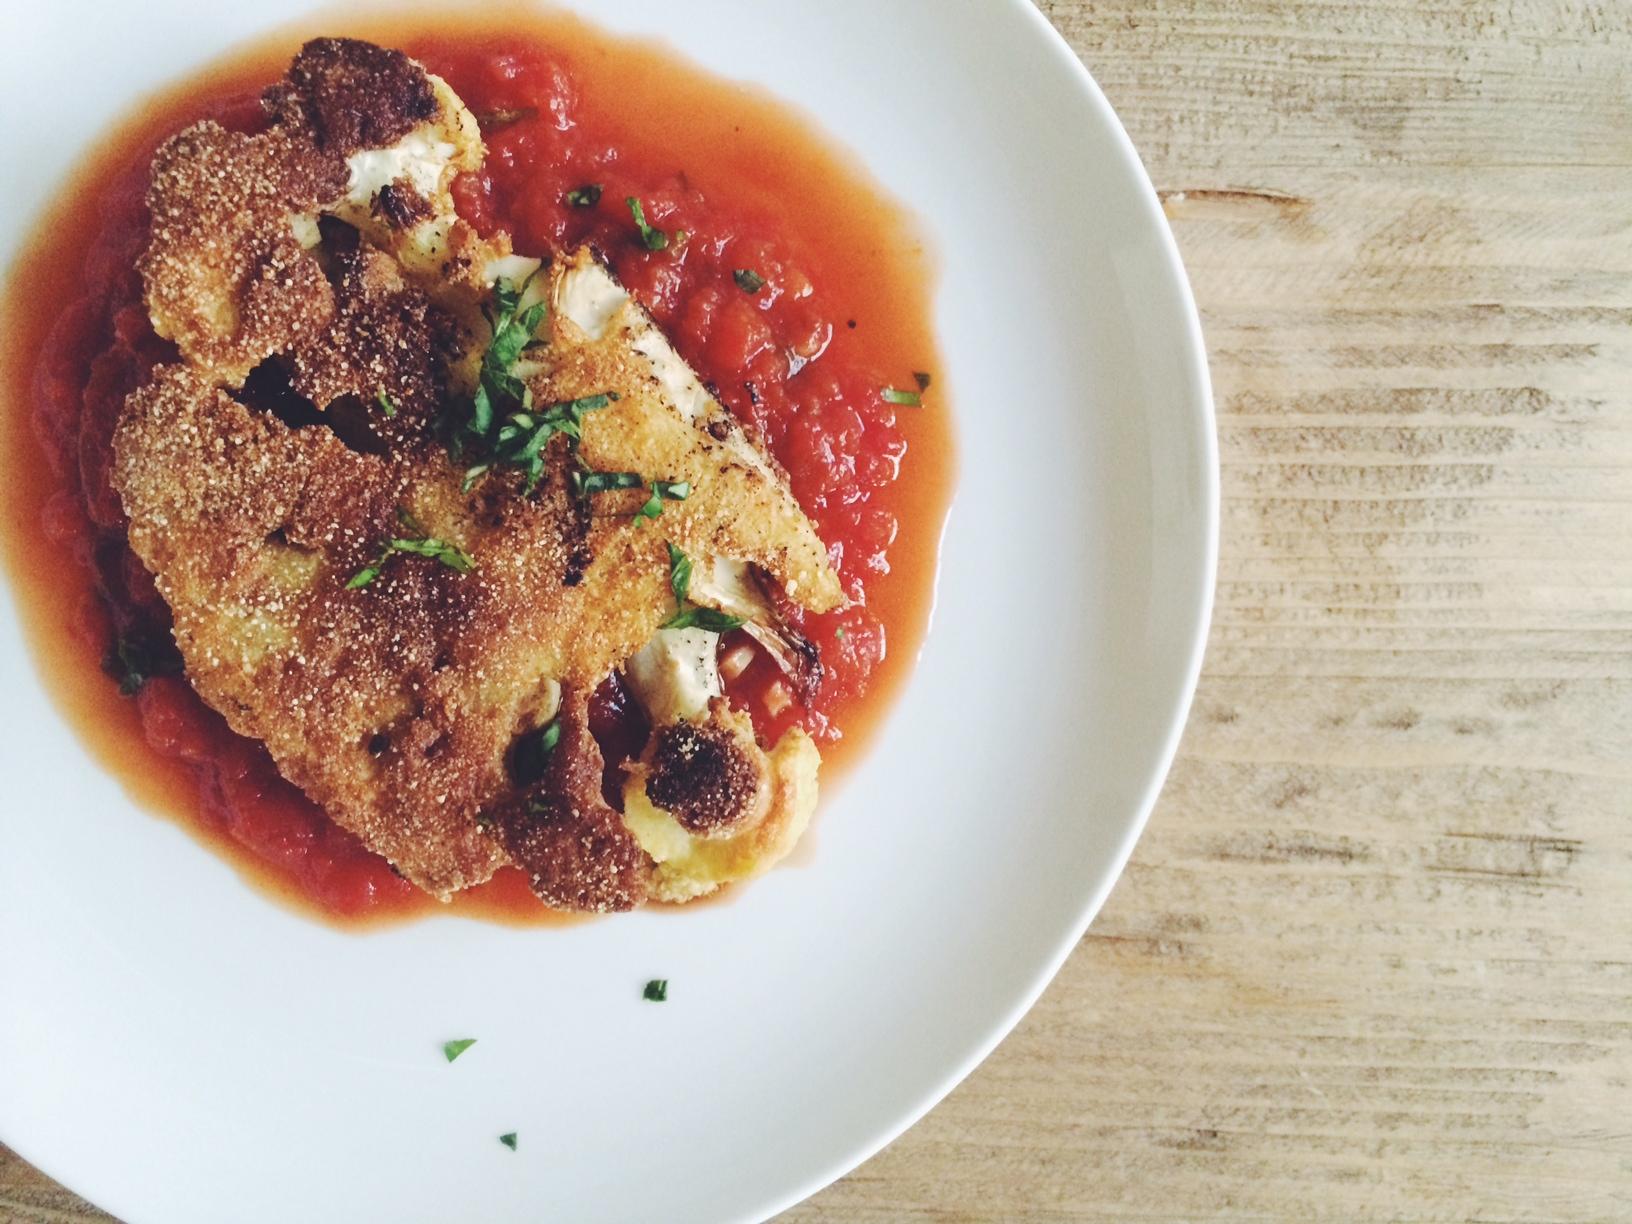 Quinoa-Flour Roasted Cauliflower Steaks with Tomato Sauce